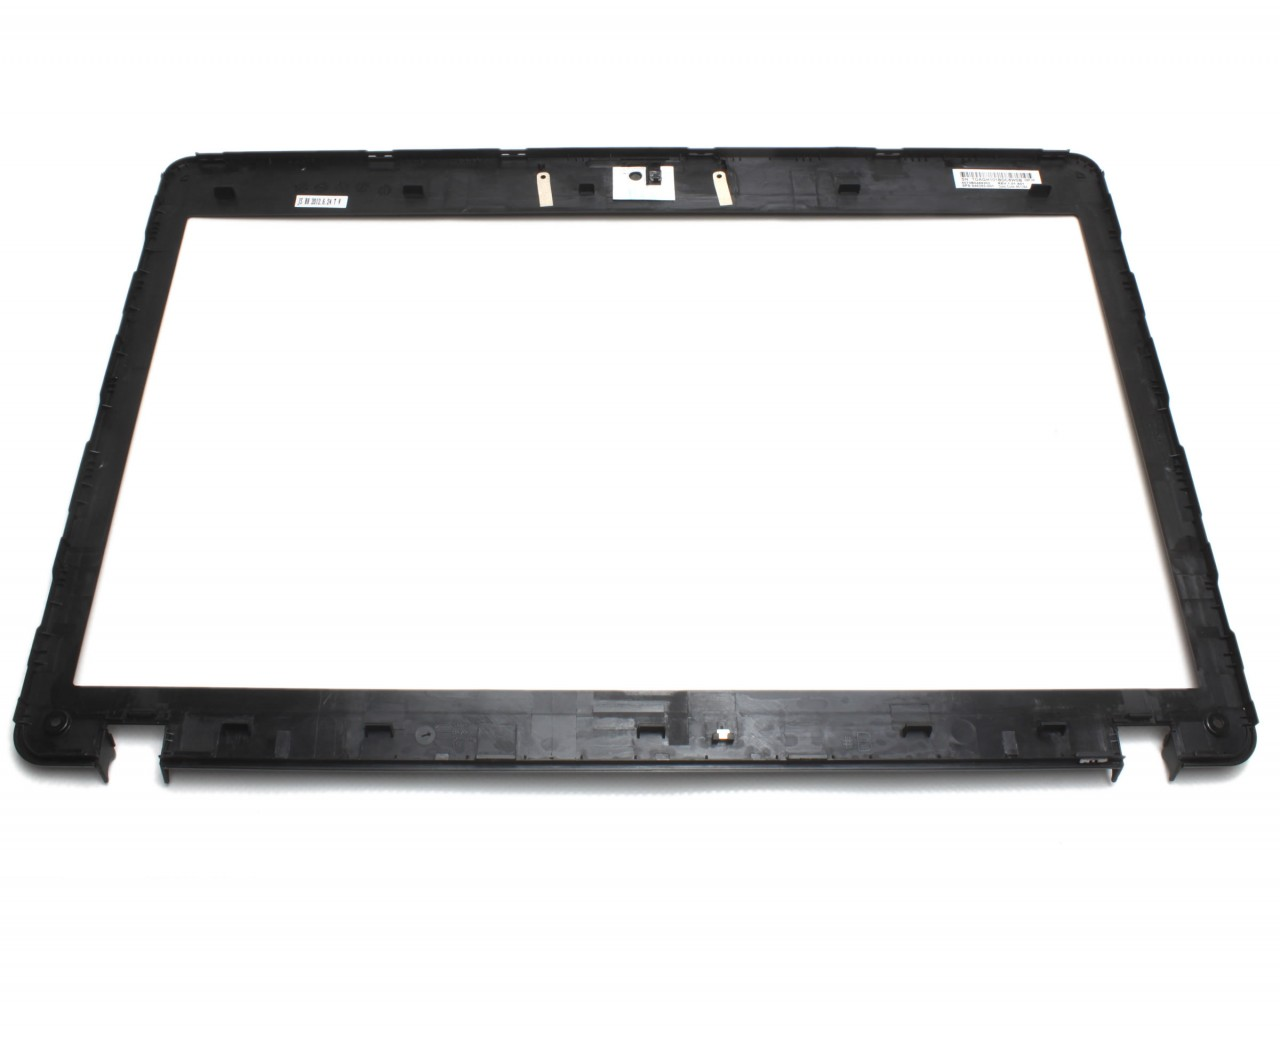 Rama Display HP 6070B0489301 Bezel Front Cover Neagra imagine powerlaptop.ro 2021